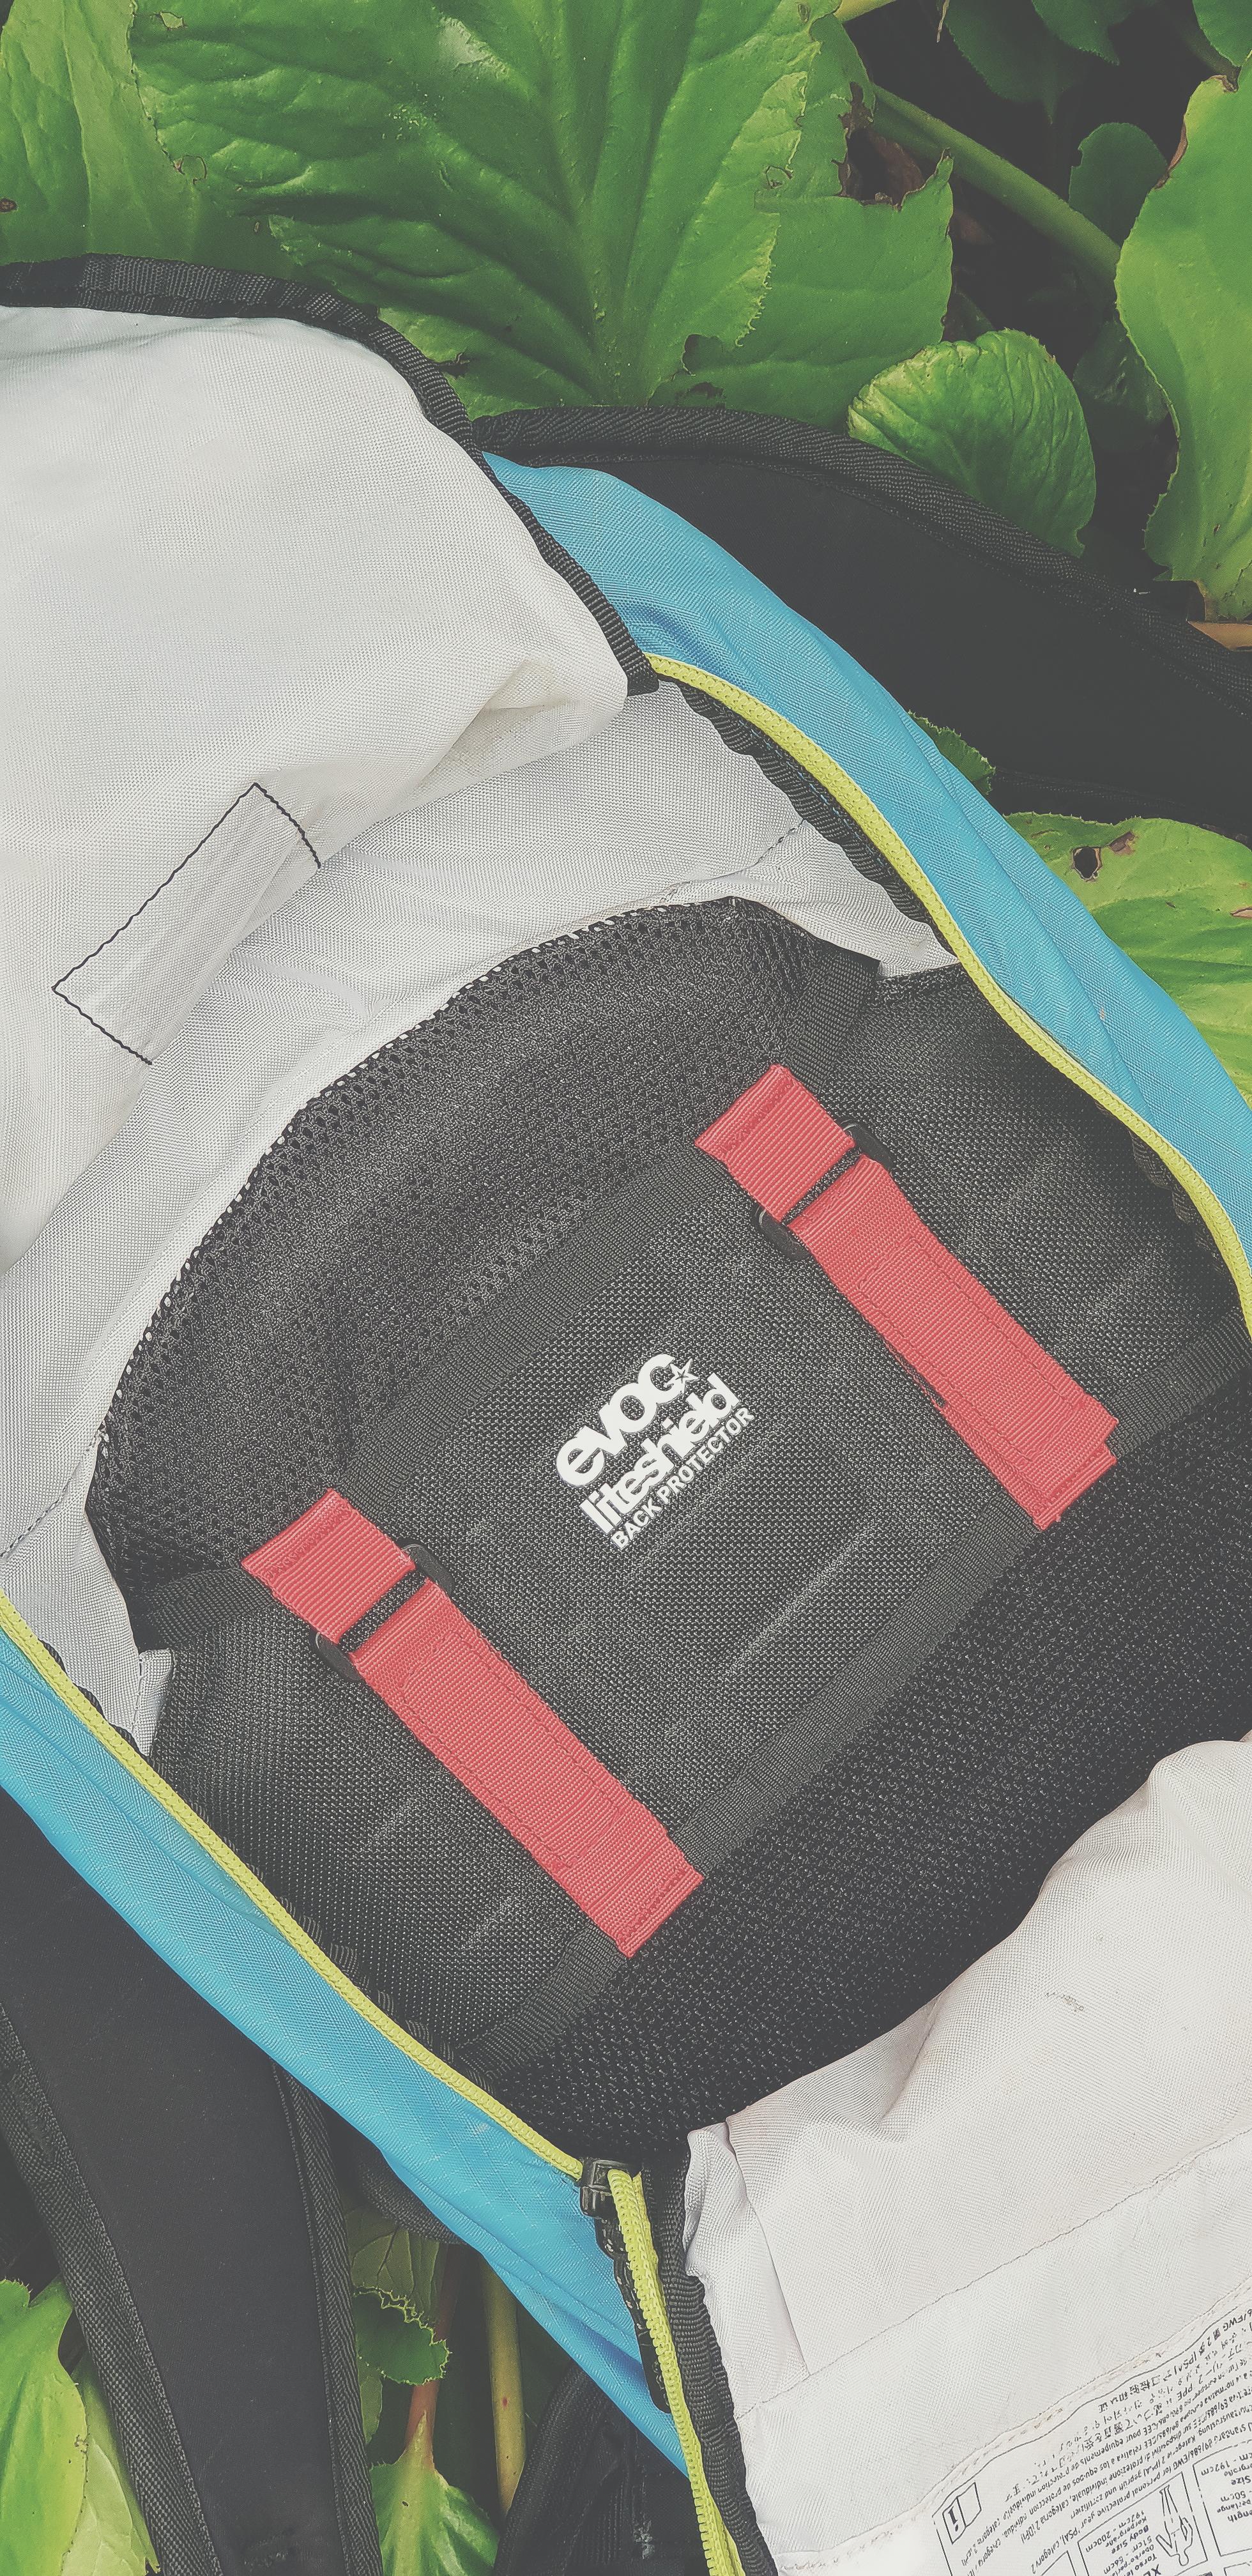 Evoc-FR-Team-Lite-backpack-long-term-review--2-